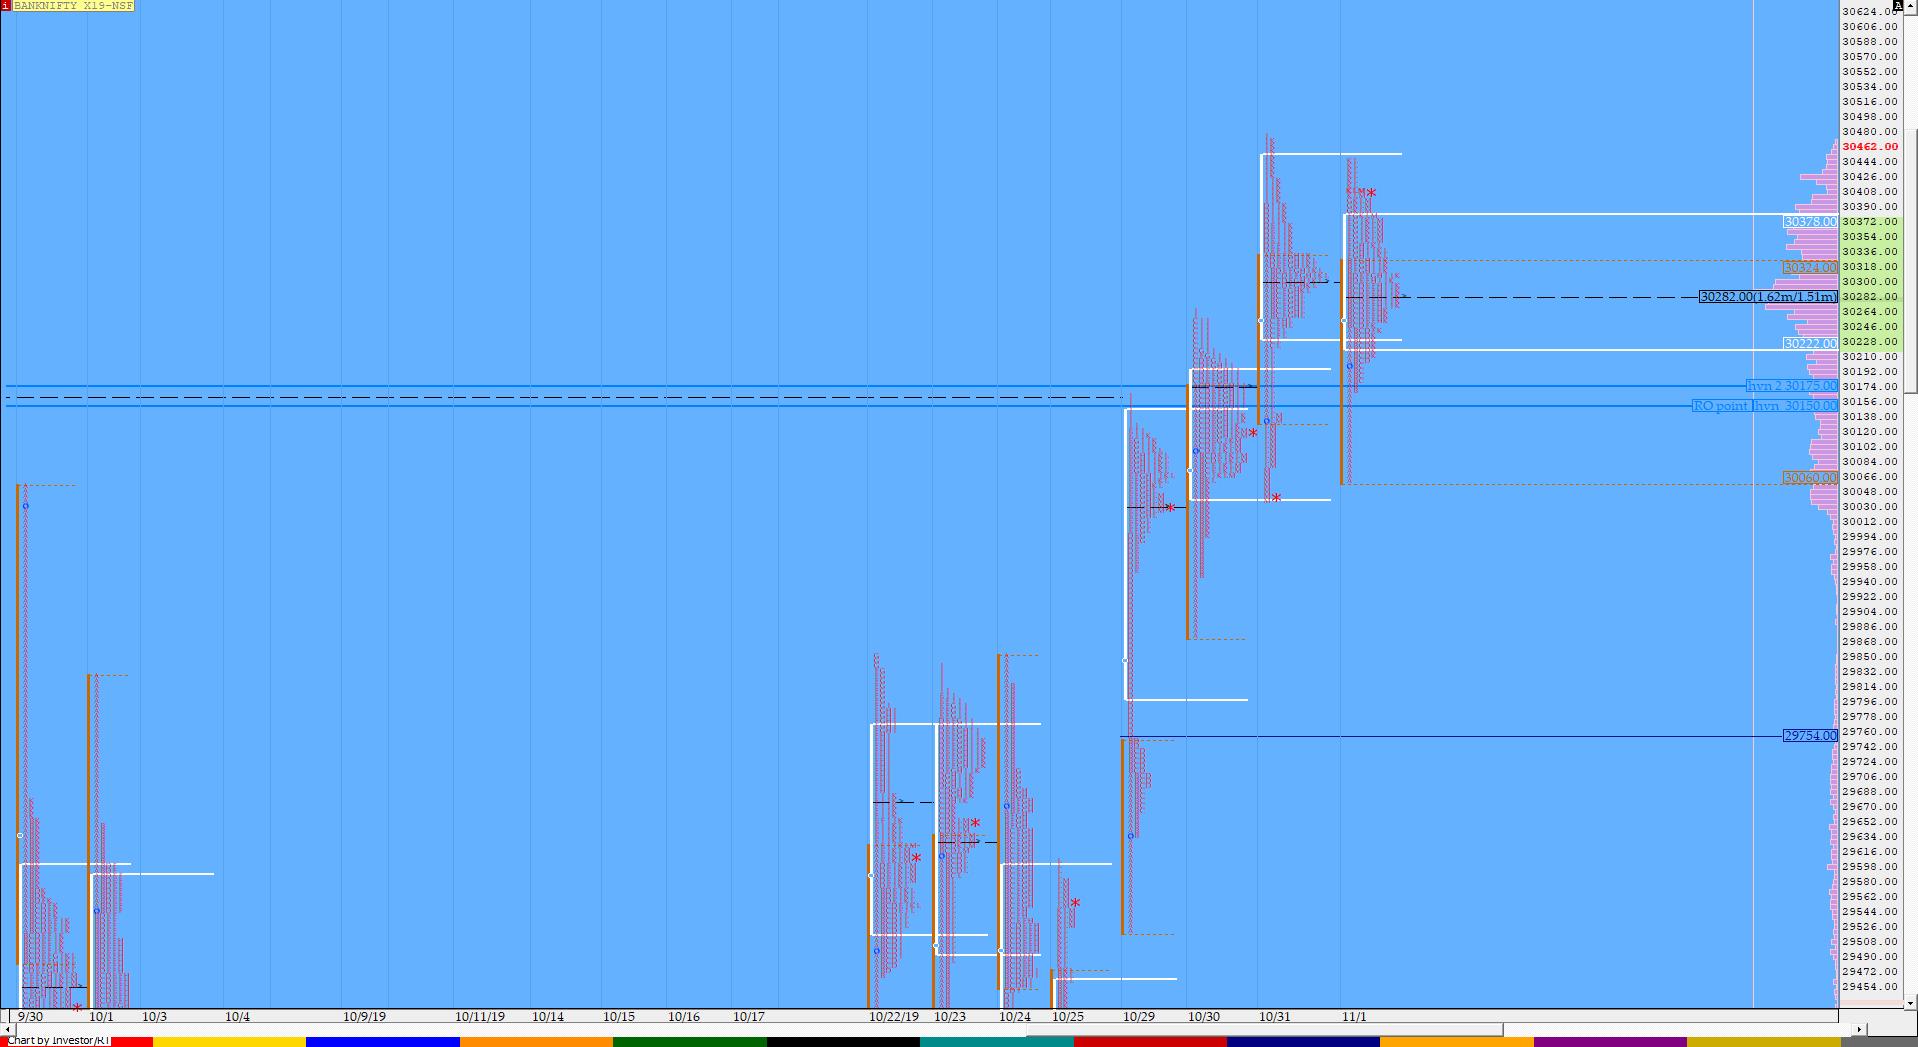 Market Profile Analysis dated 1st November 3